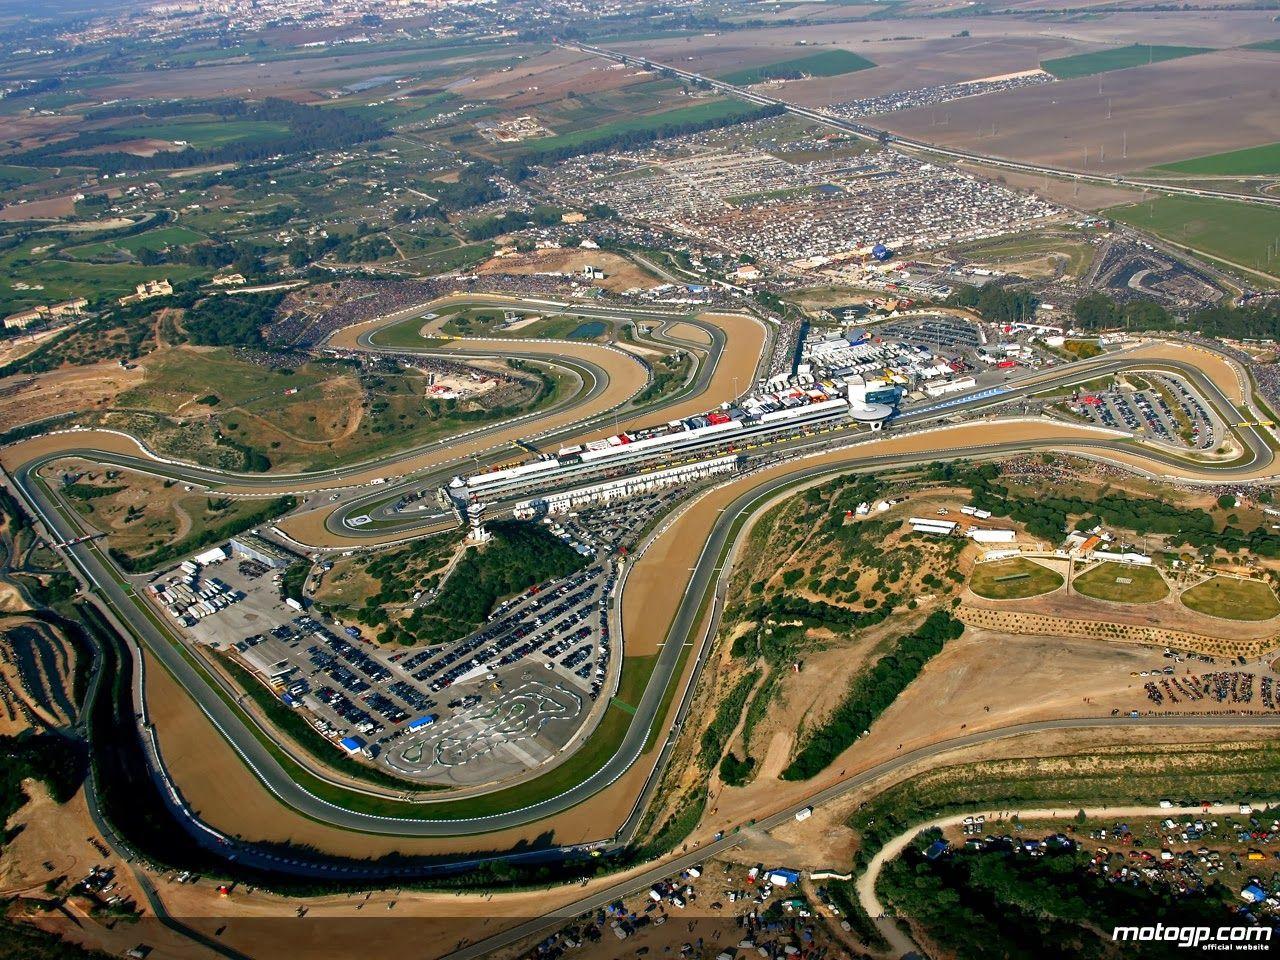 Imagen aérea del Circuito de Jerez